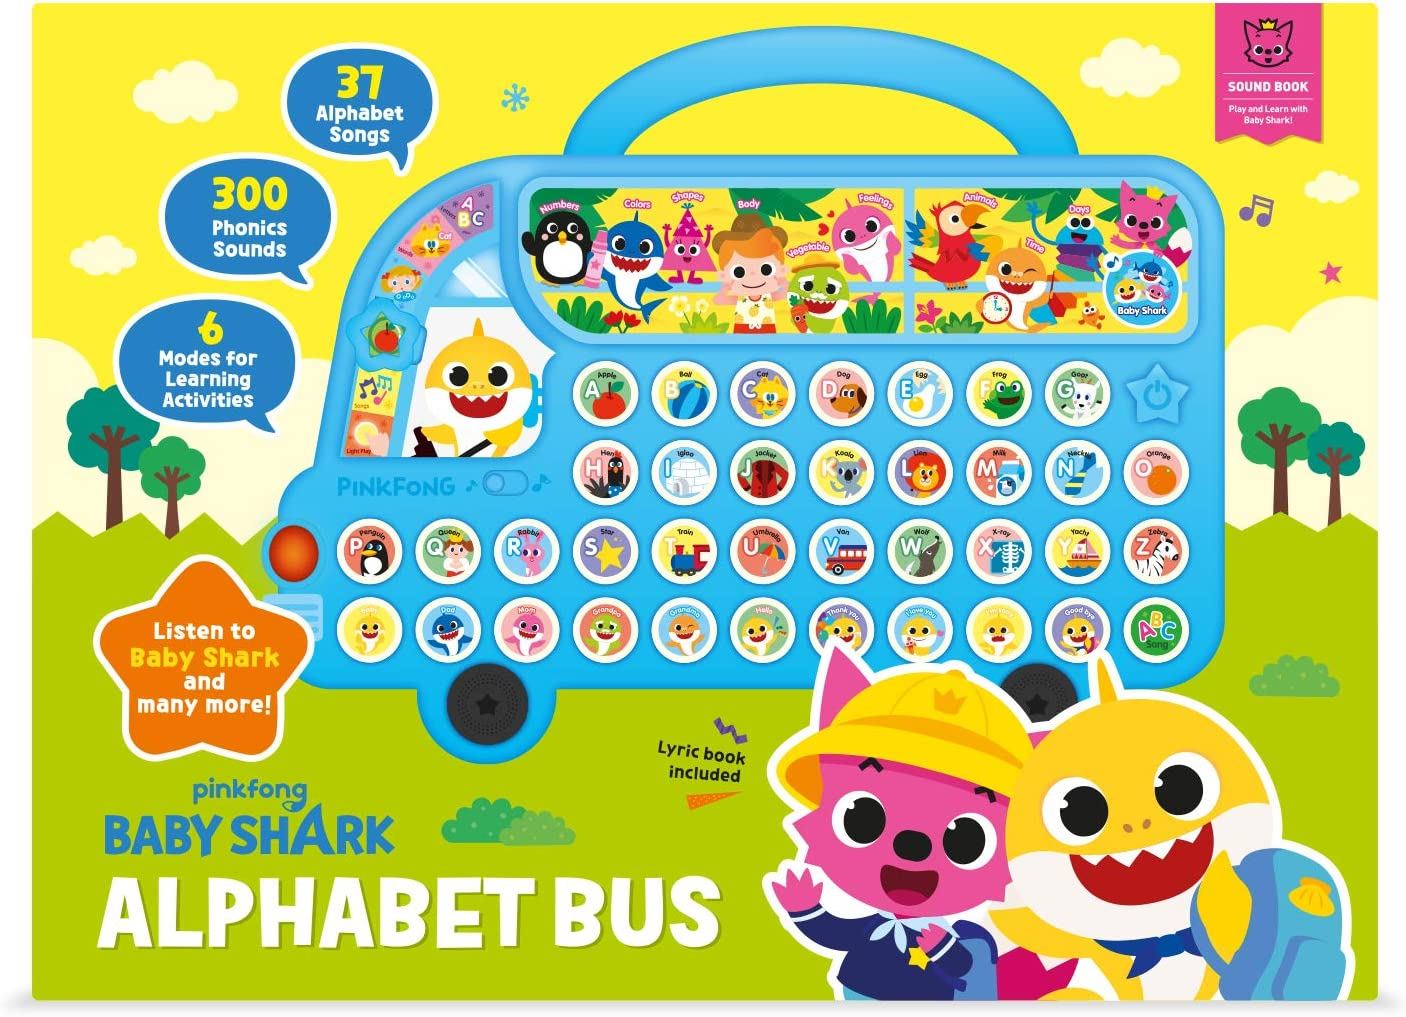 Pinkfong Baby Shark Official Alphabet Bus 2nd Edition